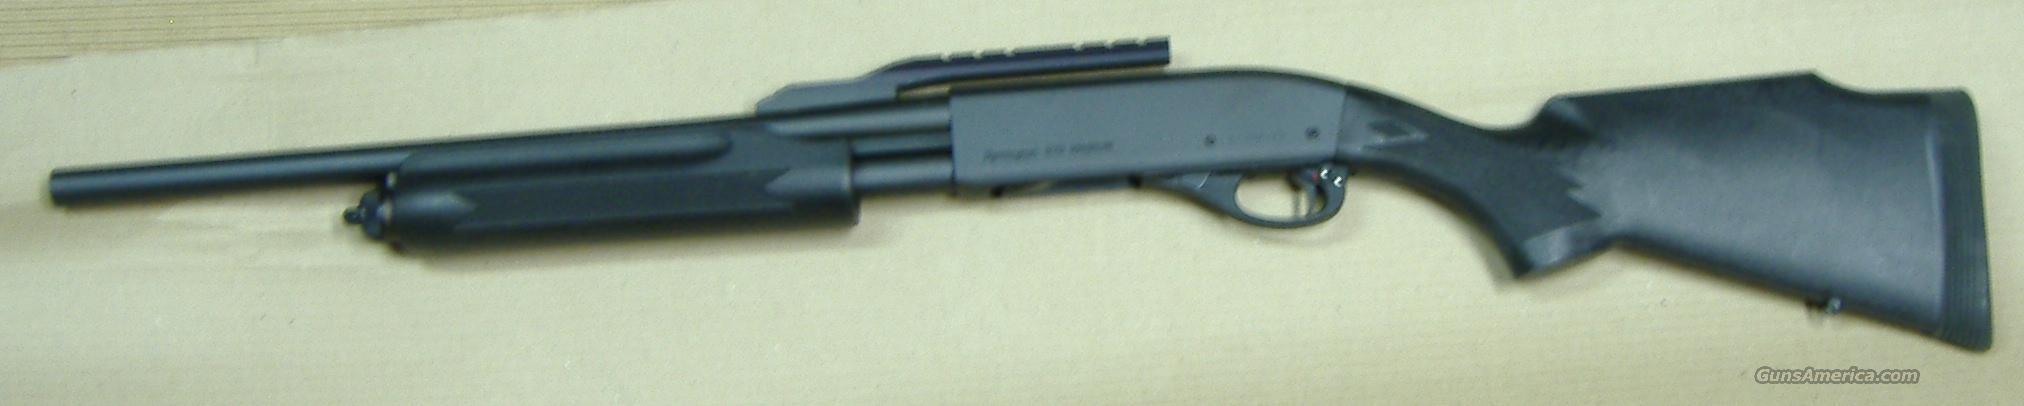 "870 SP ""DEER""  Guns > Shotguns > Remington Shotguns  > Pump > Hunting"